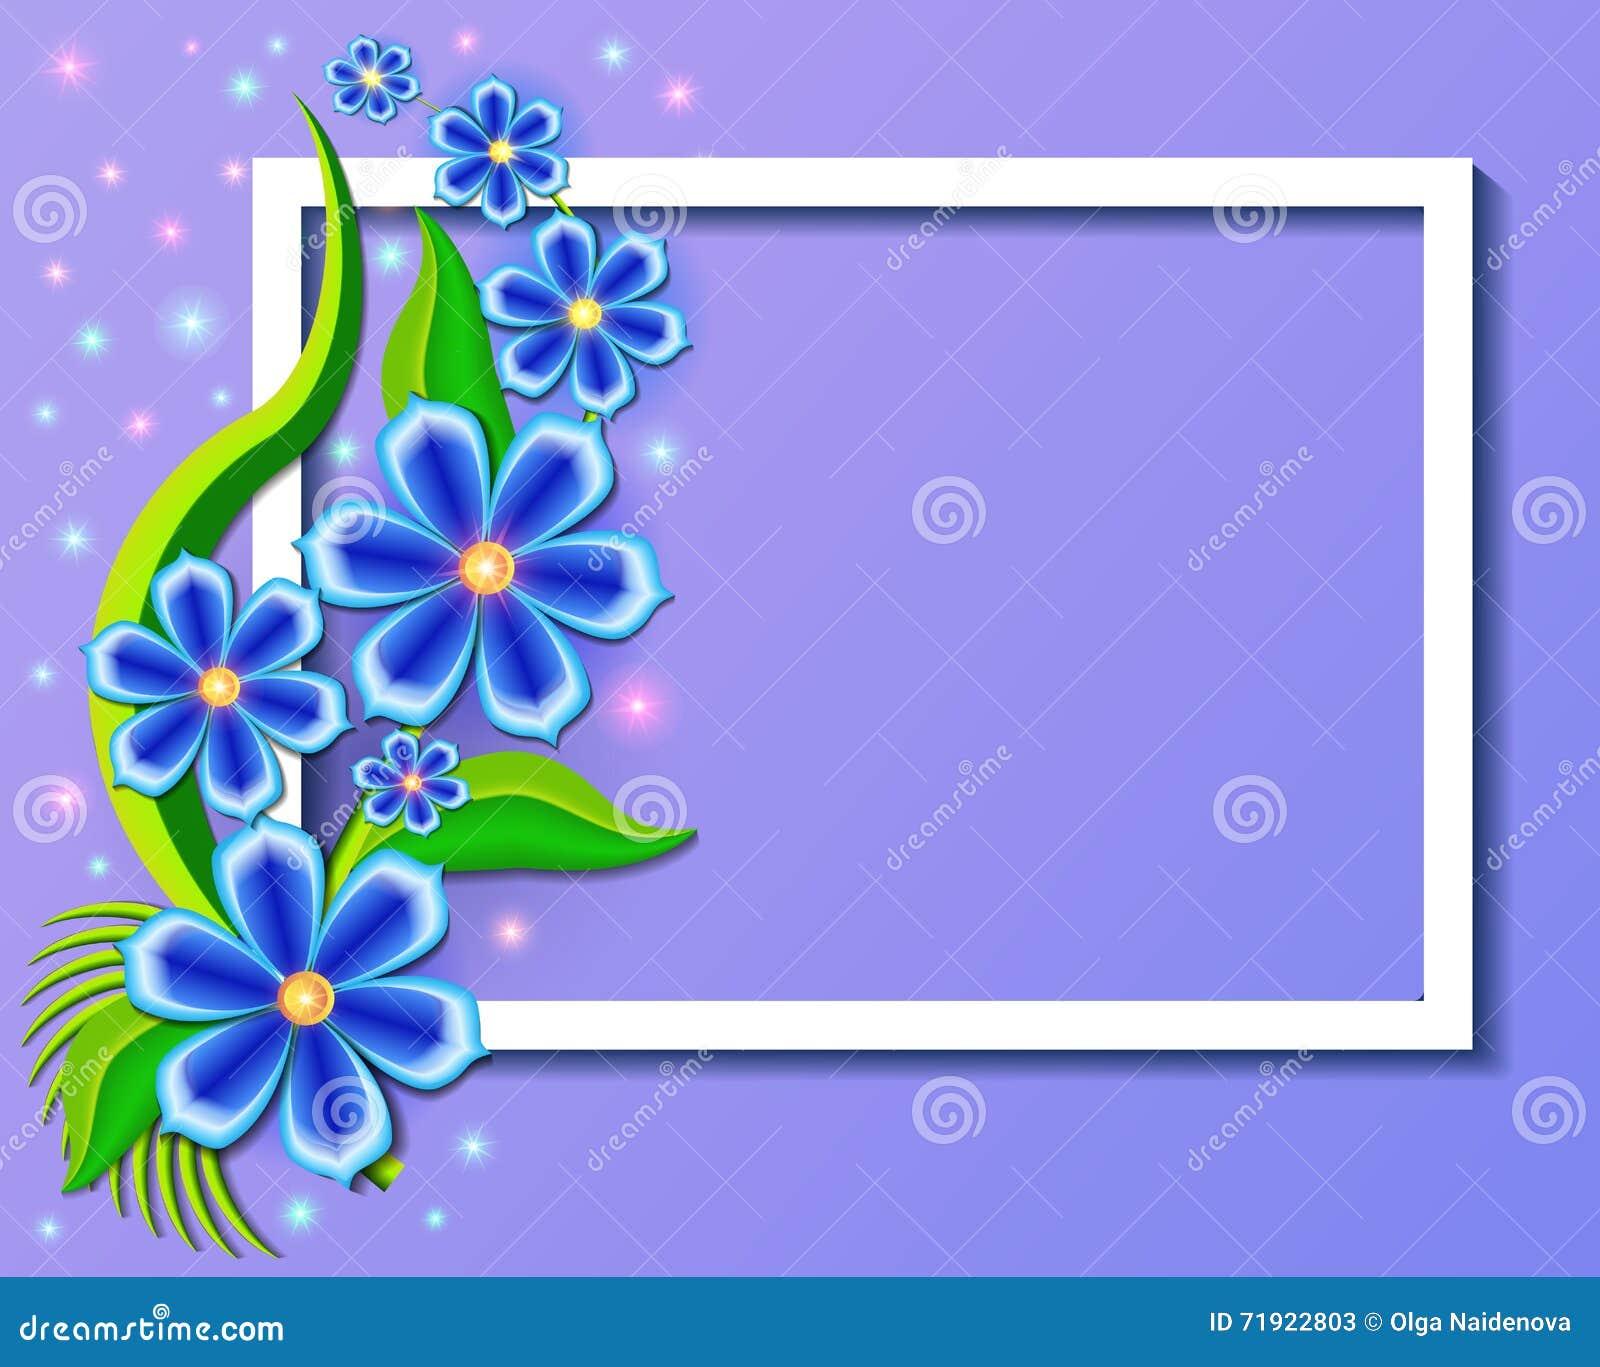 Paper Cutting Patterns Flower